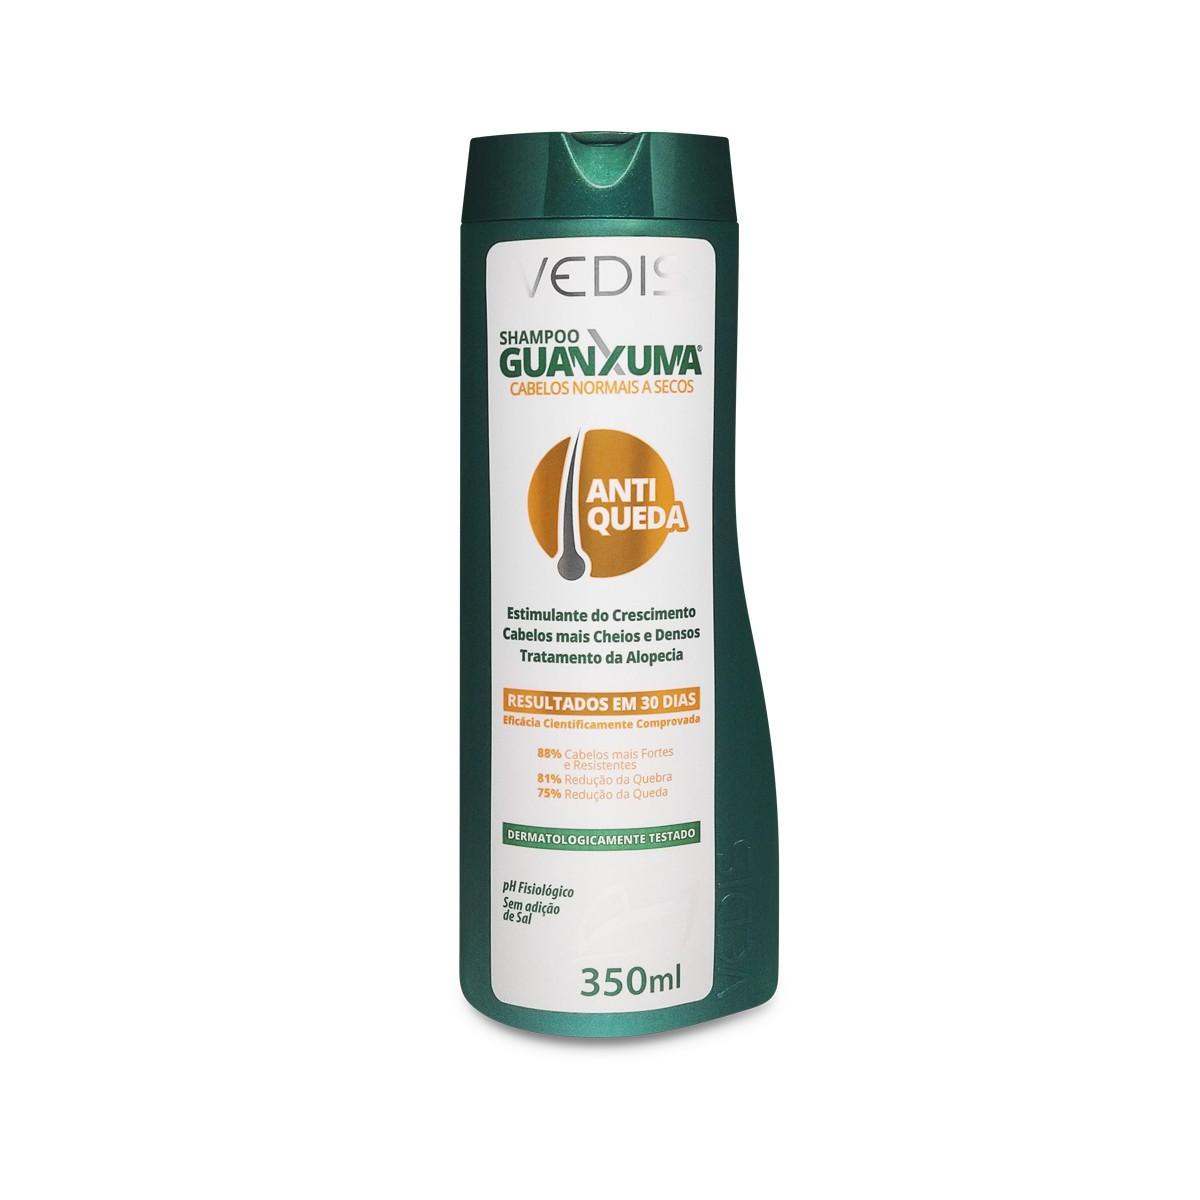 Shampoo Guanxuma Para Cabelos Secos 350ml - Vedis